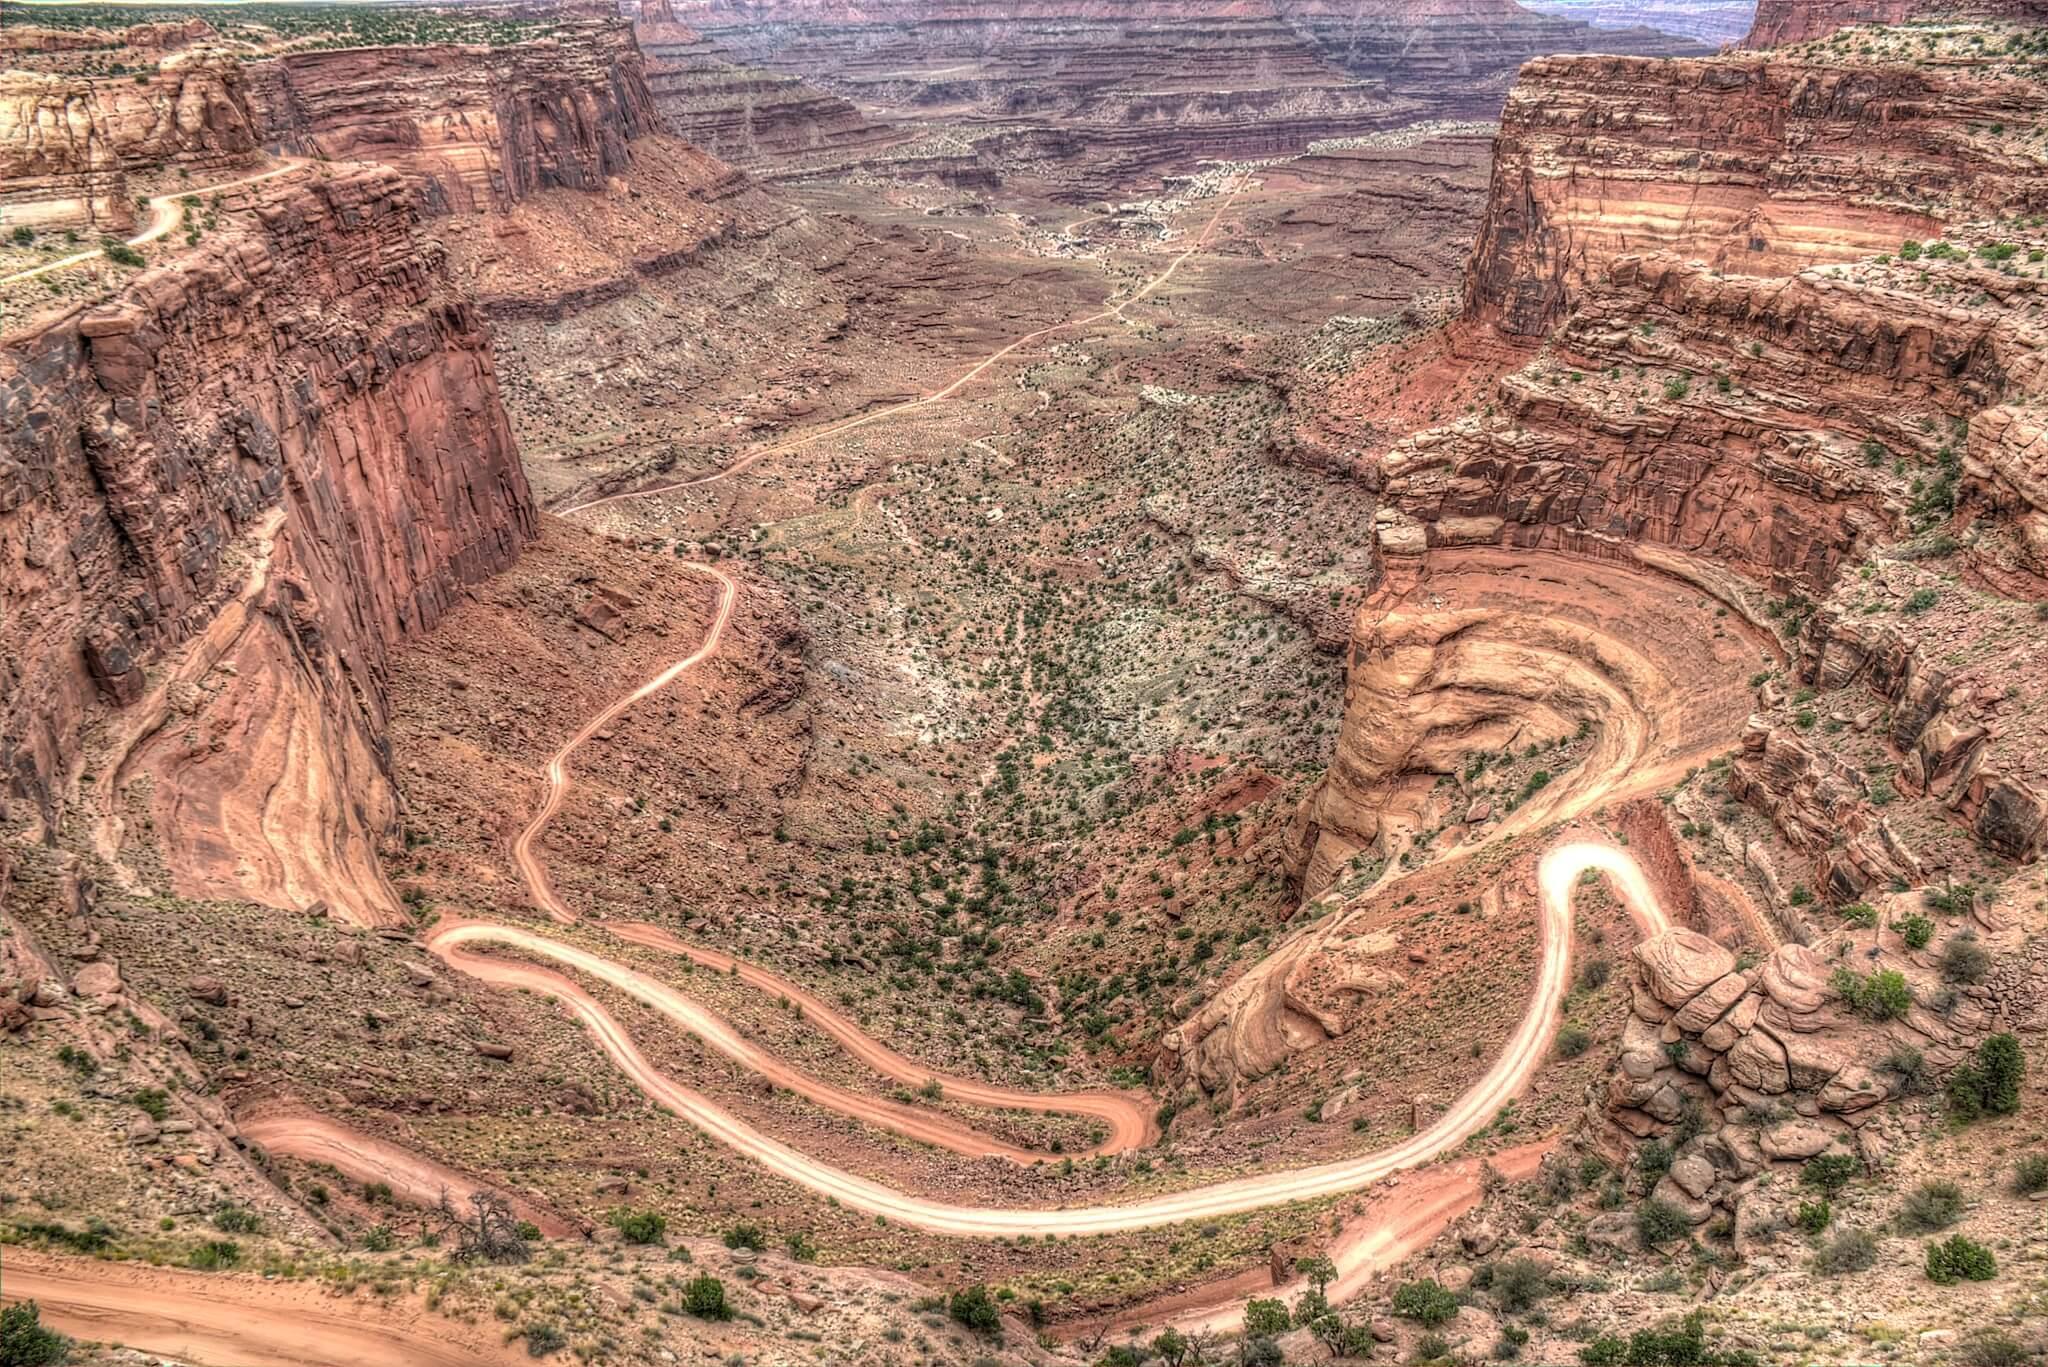 Banner-shafer-trail-canyonlands-national-park